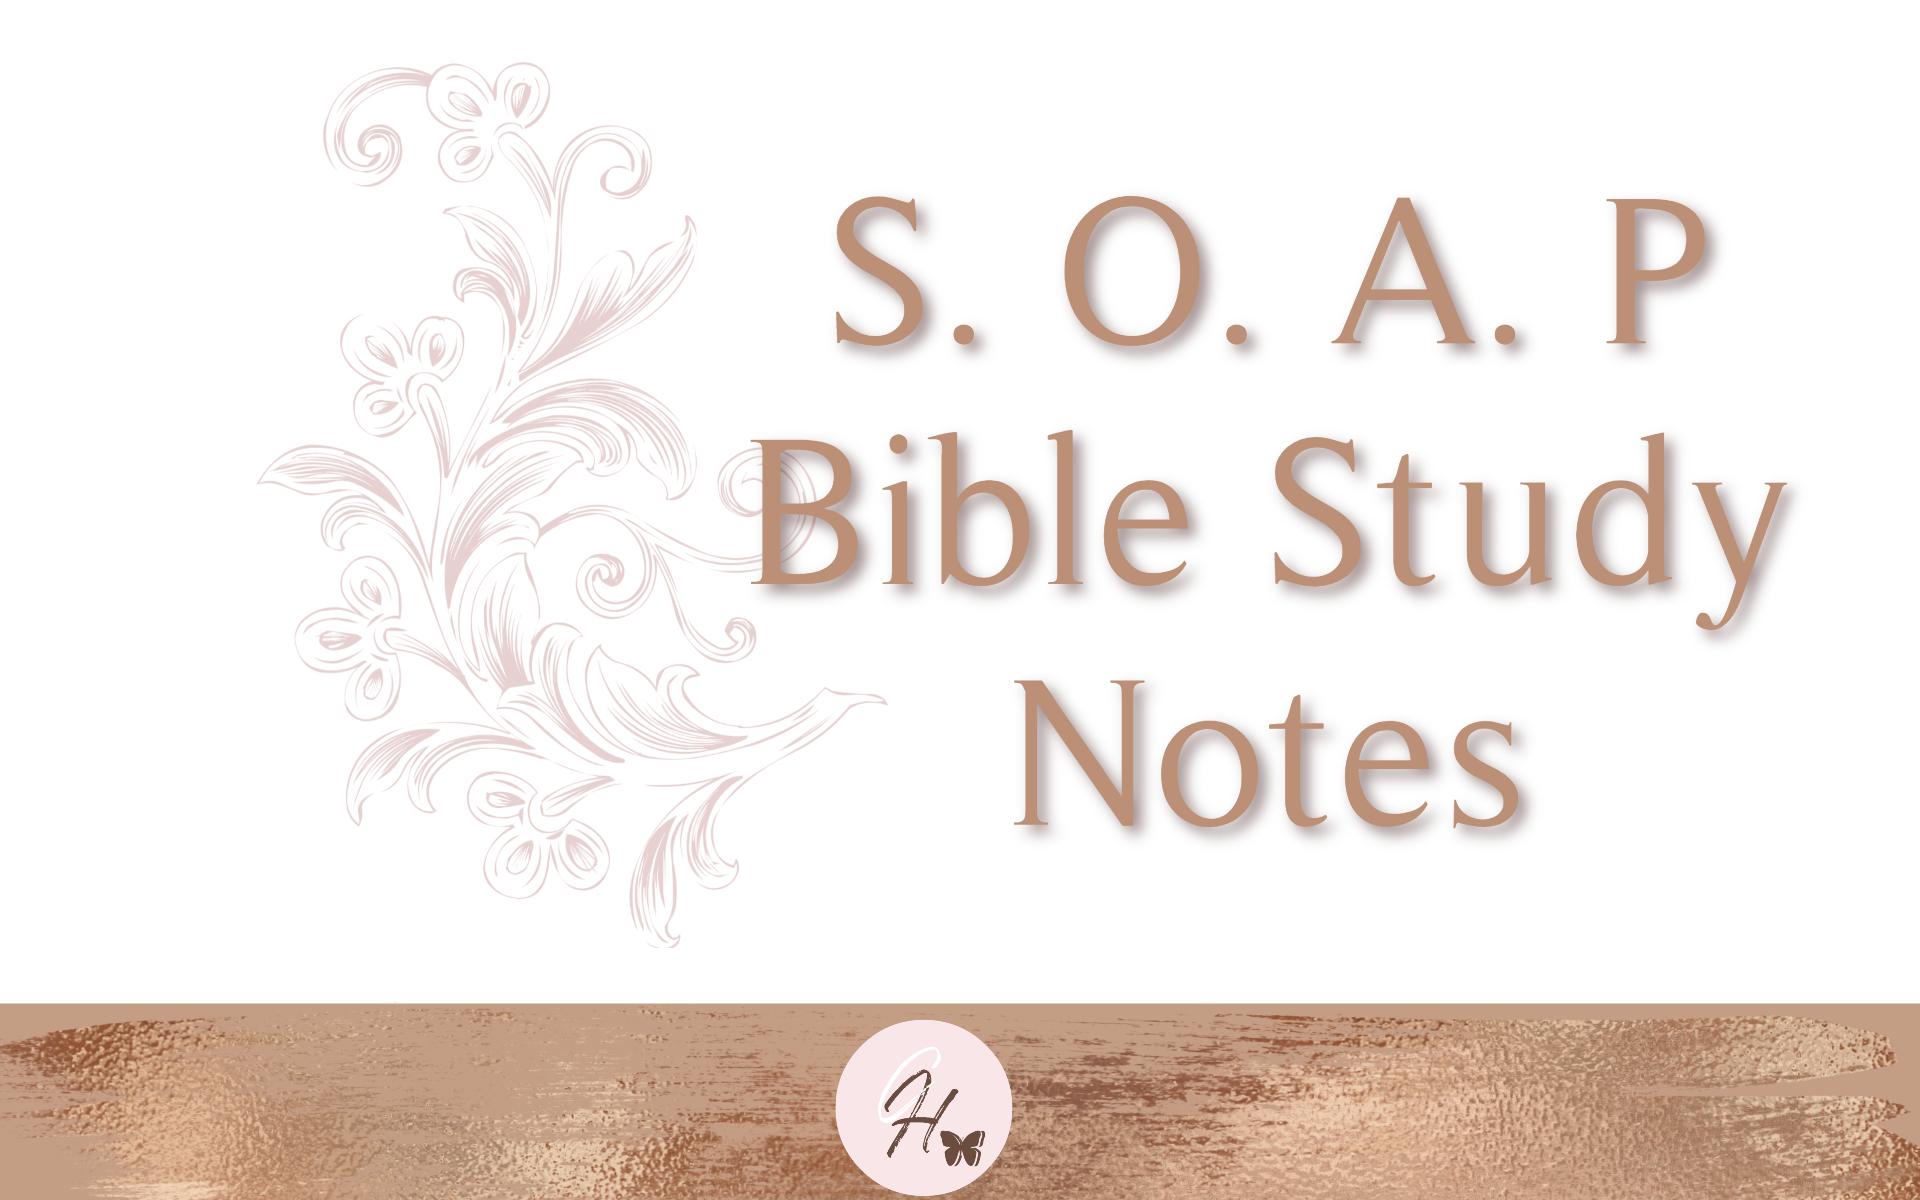 S.O.A.P Bible Study Notes